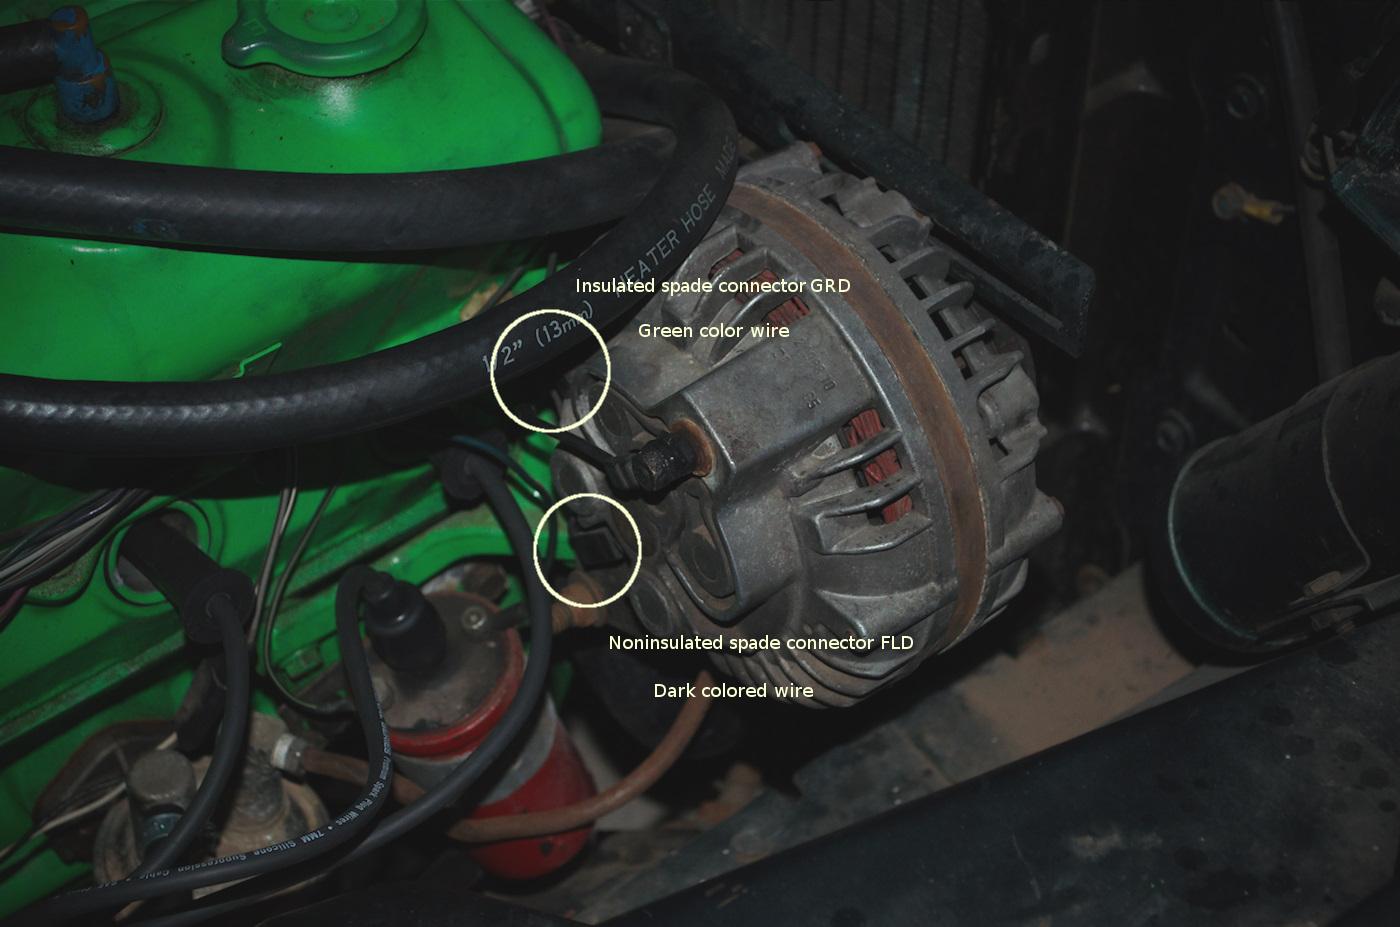 73 Plymouth Slant 6 Alternator Diagram Trusted Wiring Diagrams 1973 Valiant Engine Six Services U2022 Dodge Torque Specs